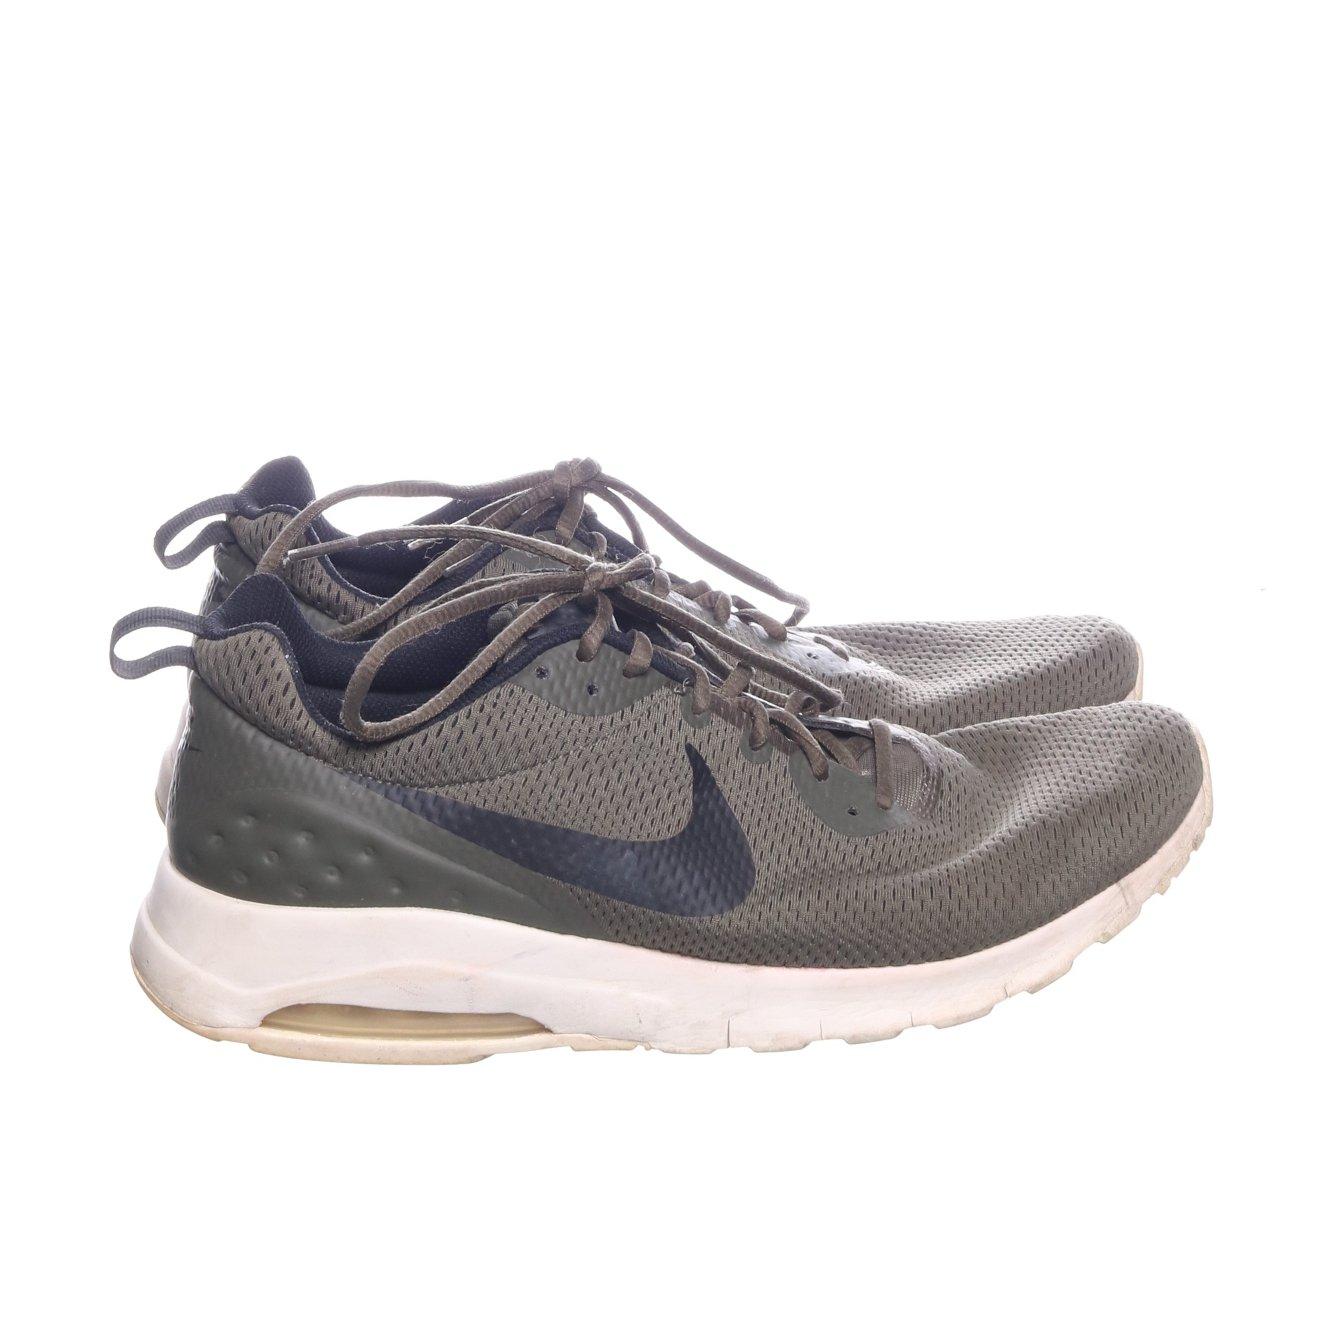 best service 0ca40 0aab6 Nike Air, Sneakers, Strl  45, 844836-302, Mossgrön Mörkgrön ...